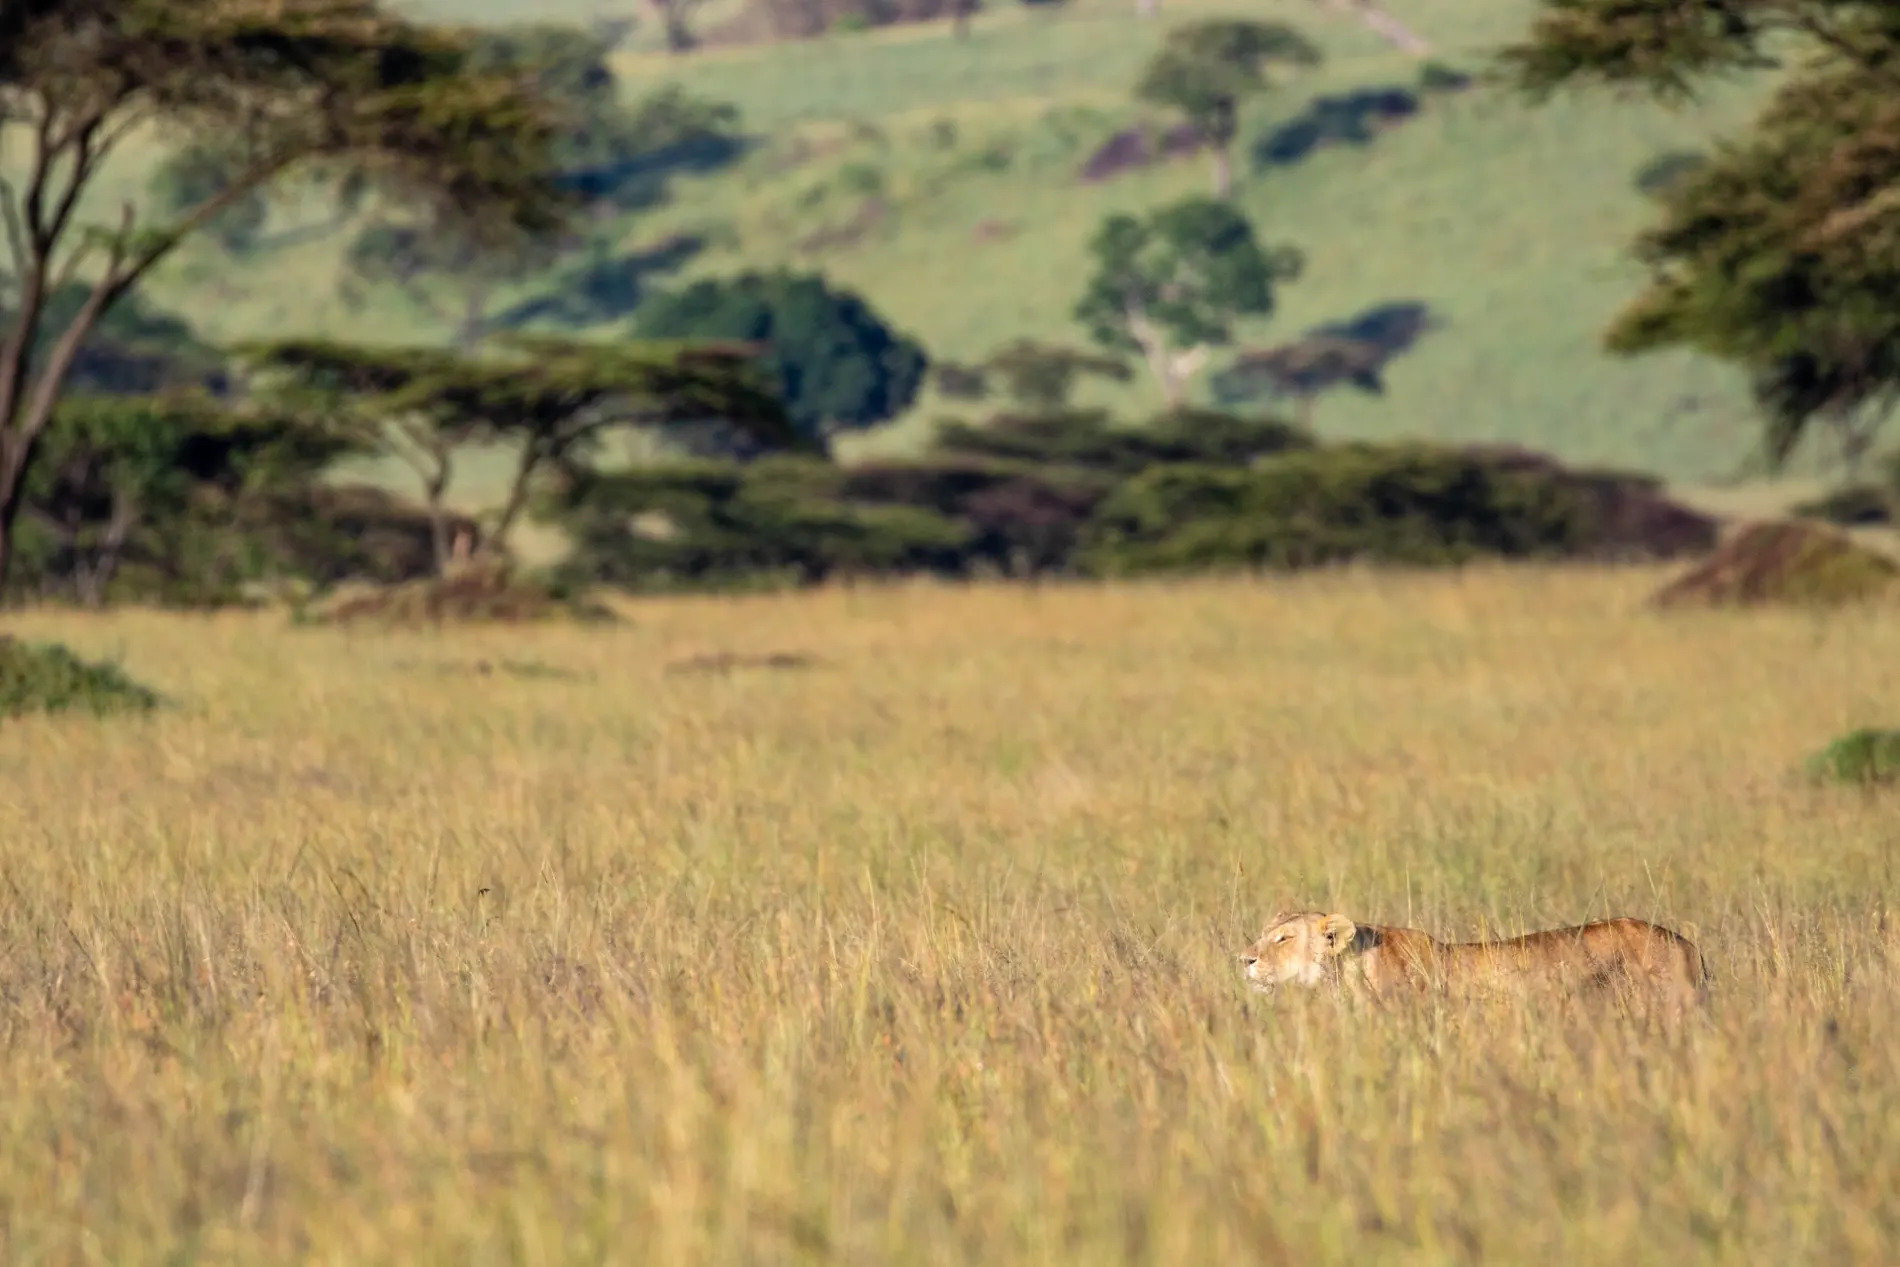 LION DANGER IN THE GRASS